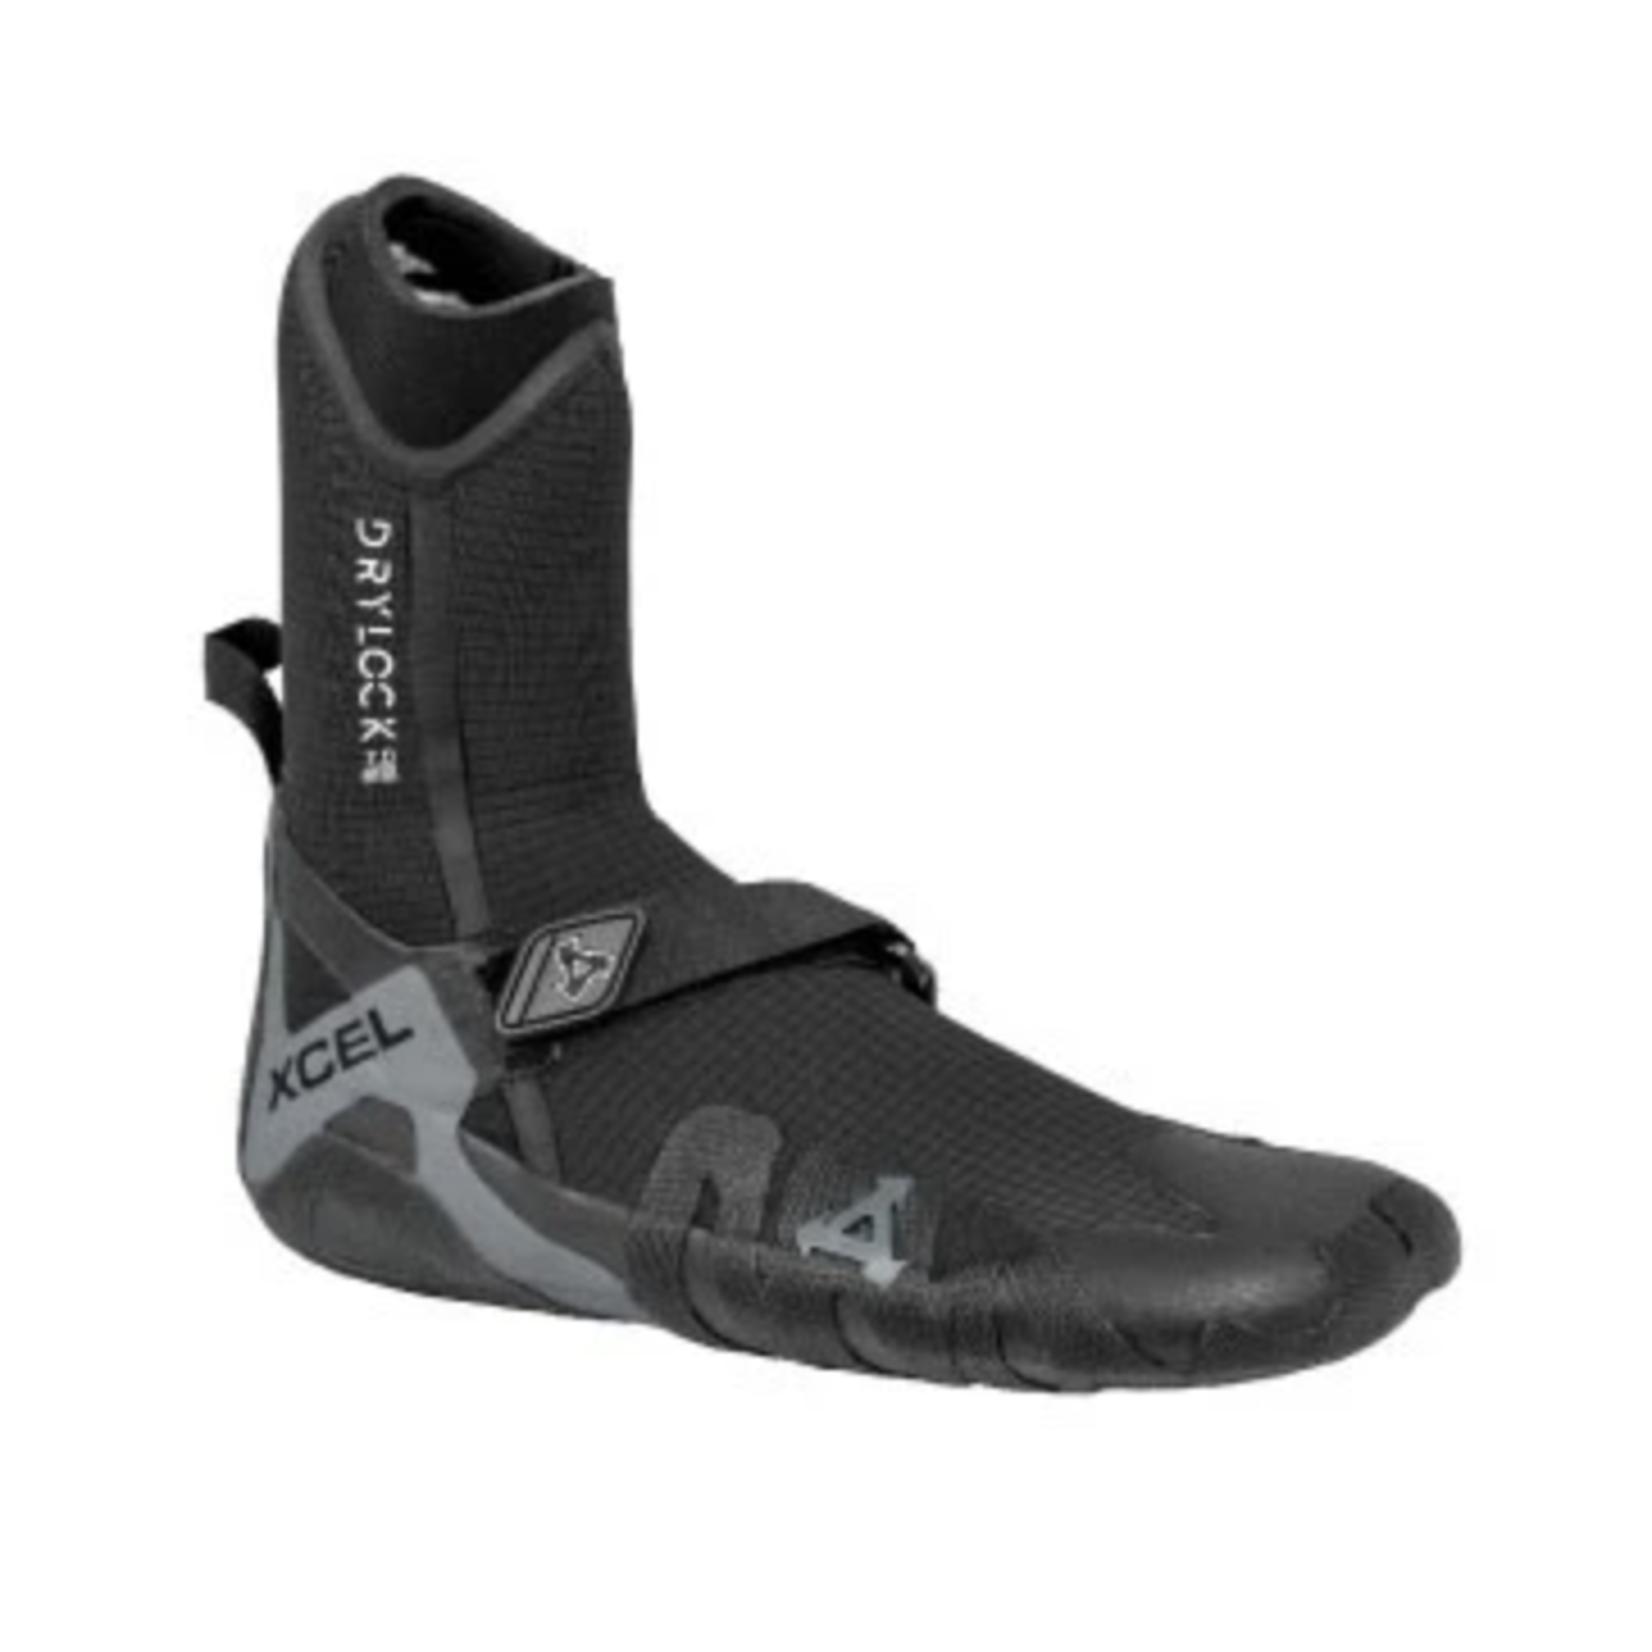 XCEL XCEL Drylock 7mm Round Toe Boot